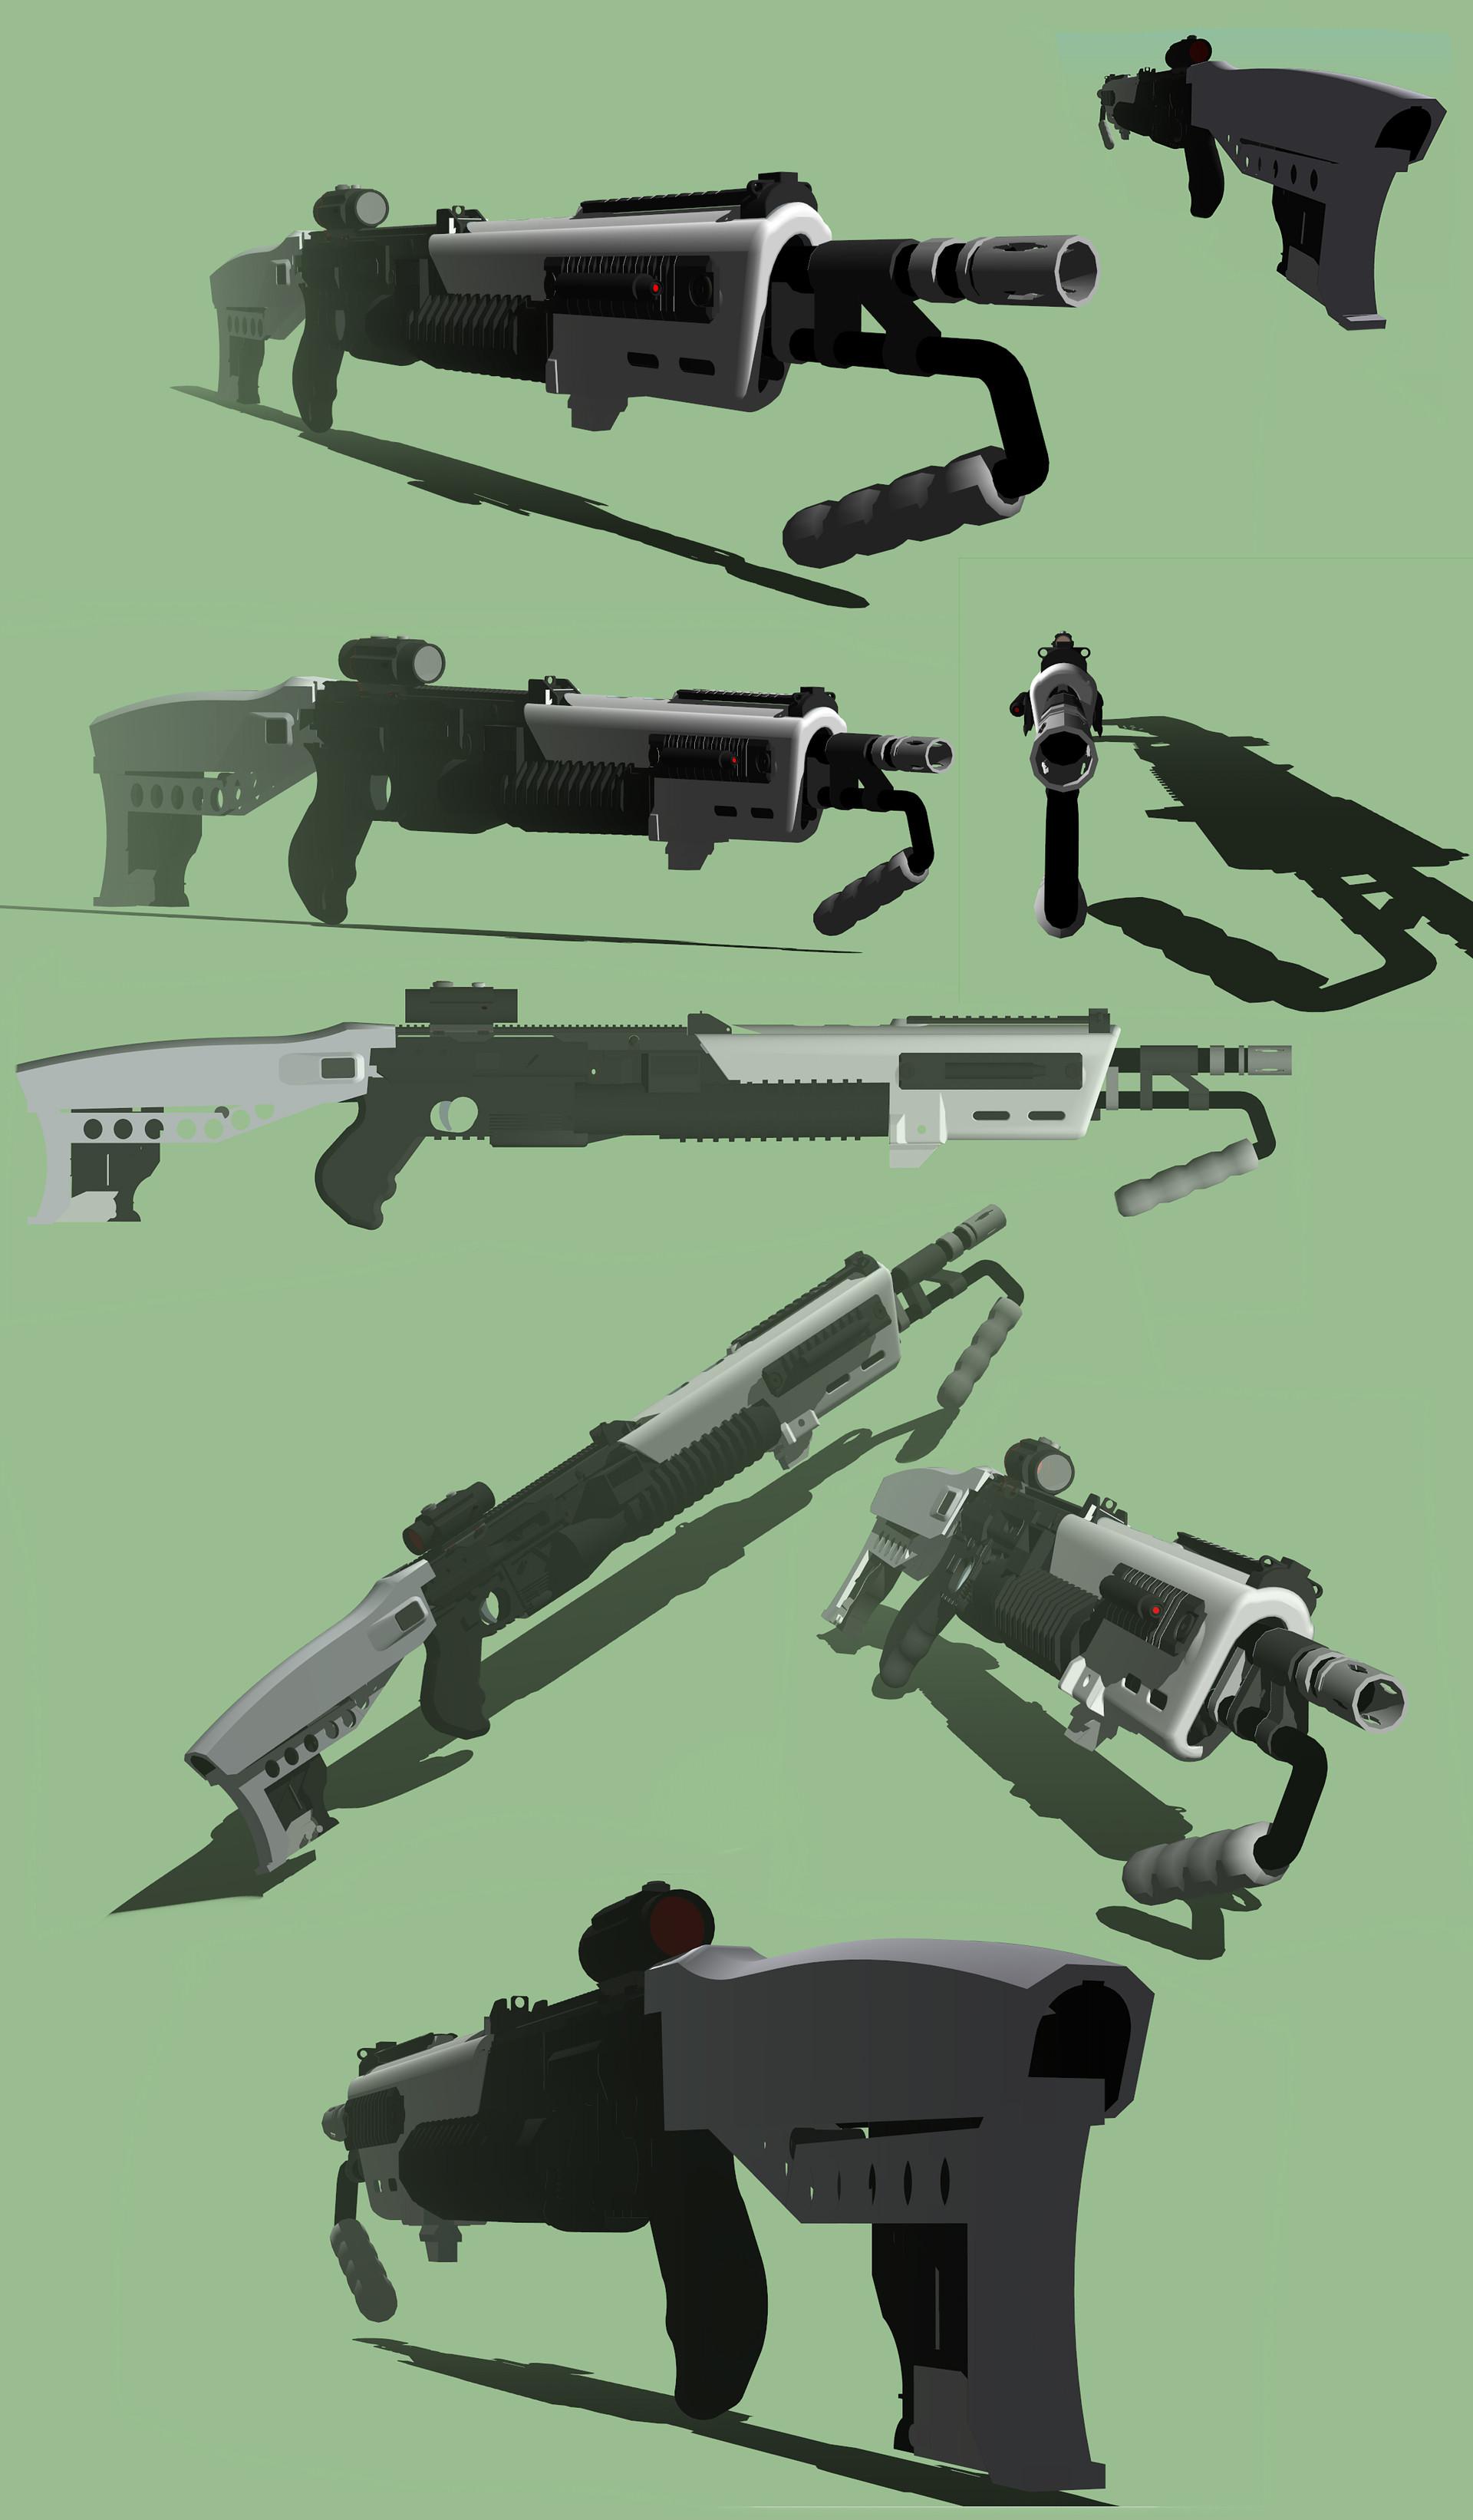 Cristian bruno lai type pump shotgun